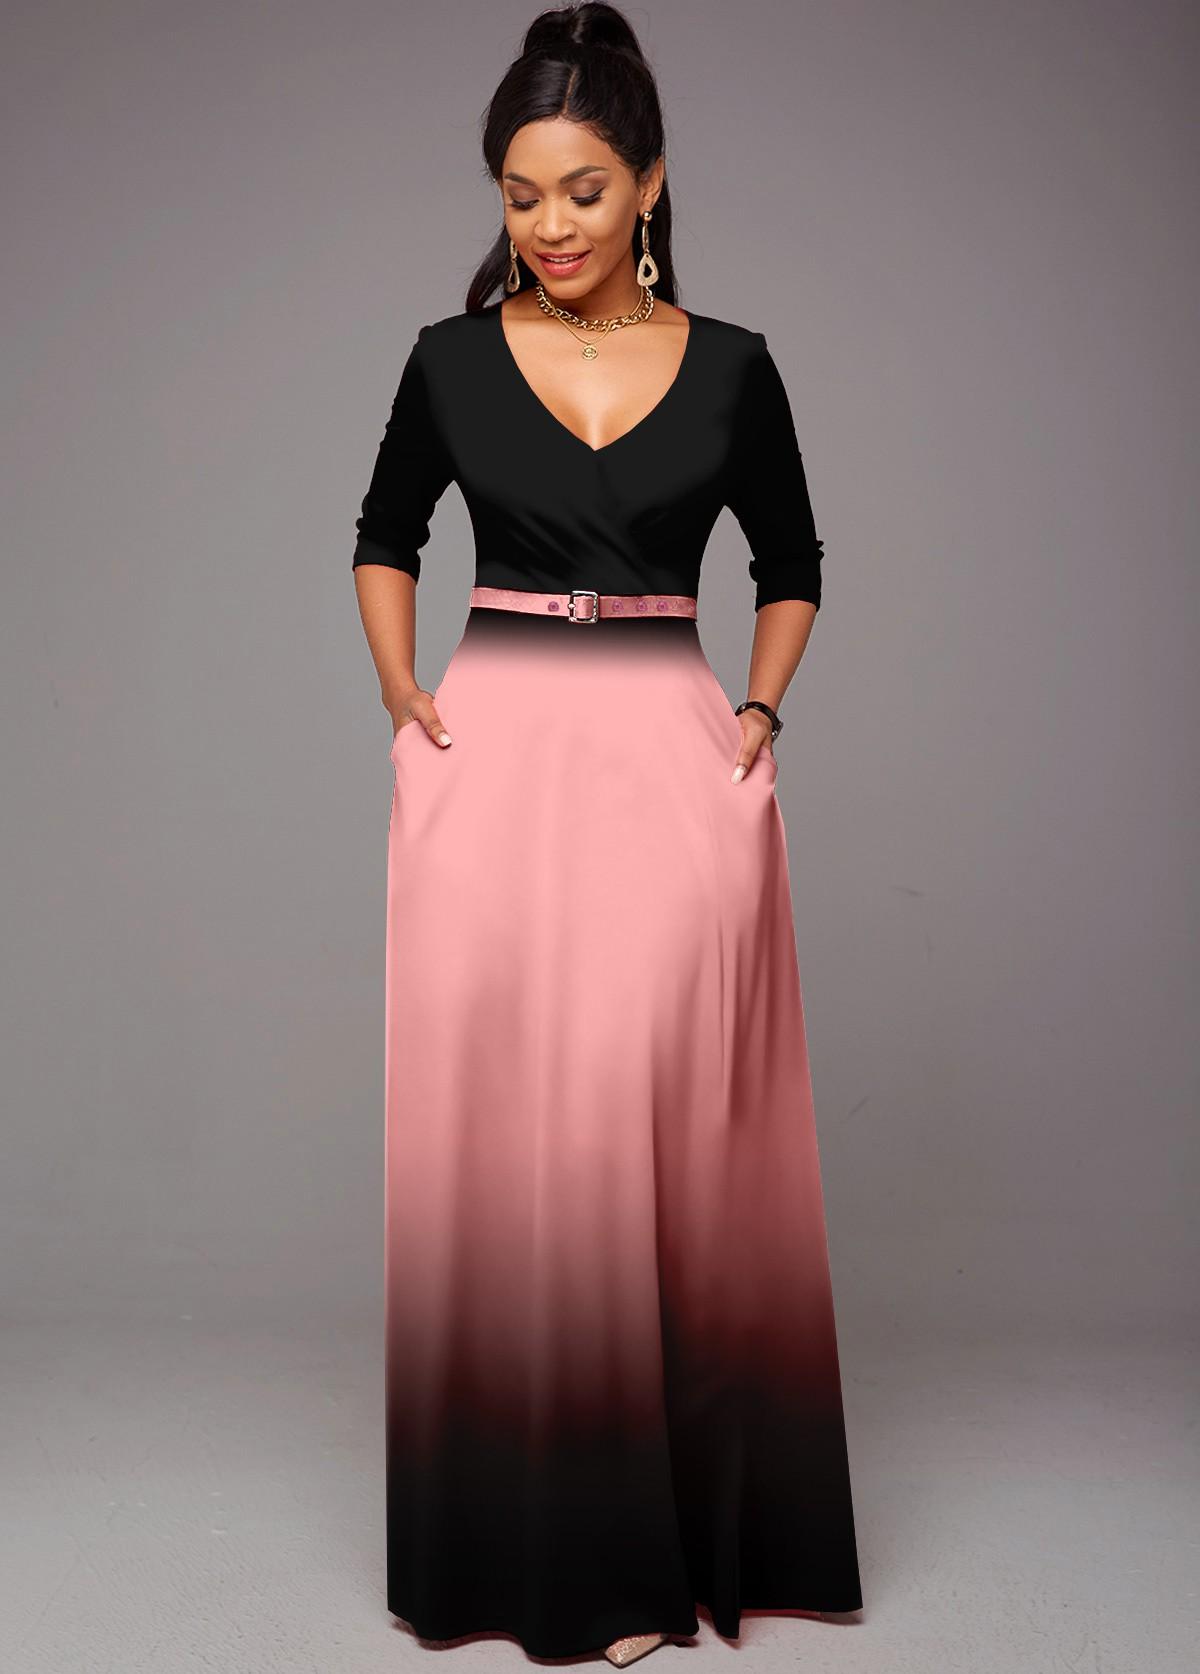 ROTITA Belted Ombre Double Side Pockets V Neck Dress